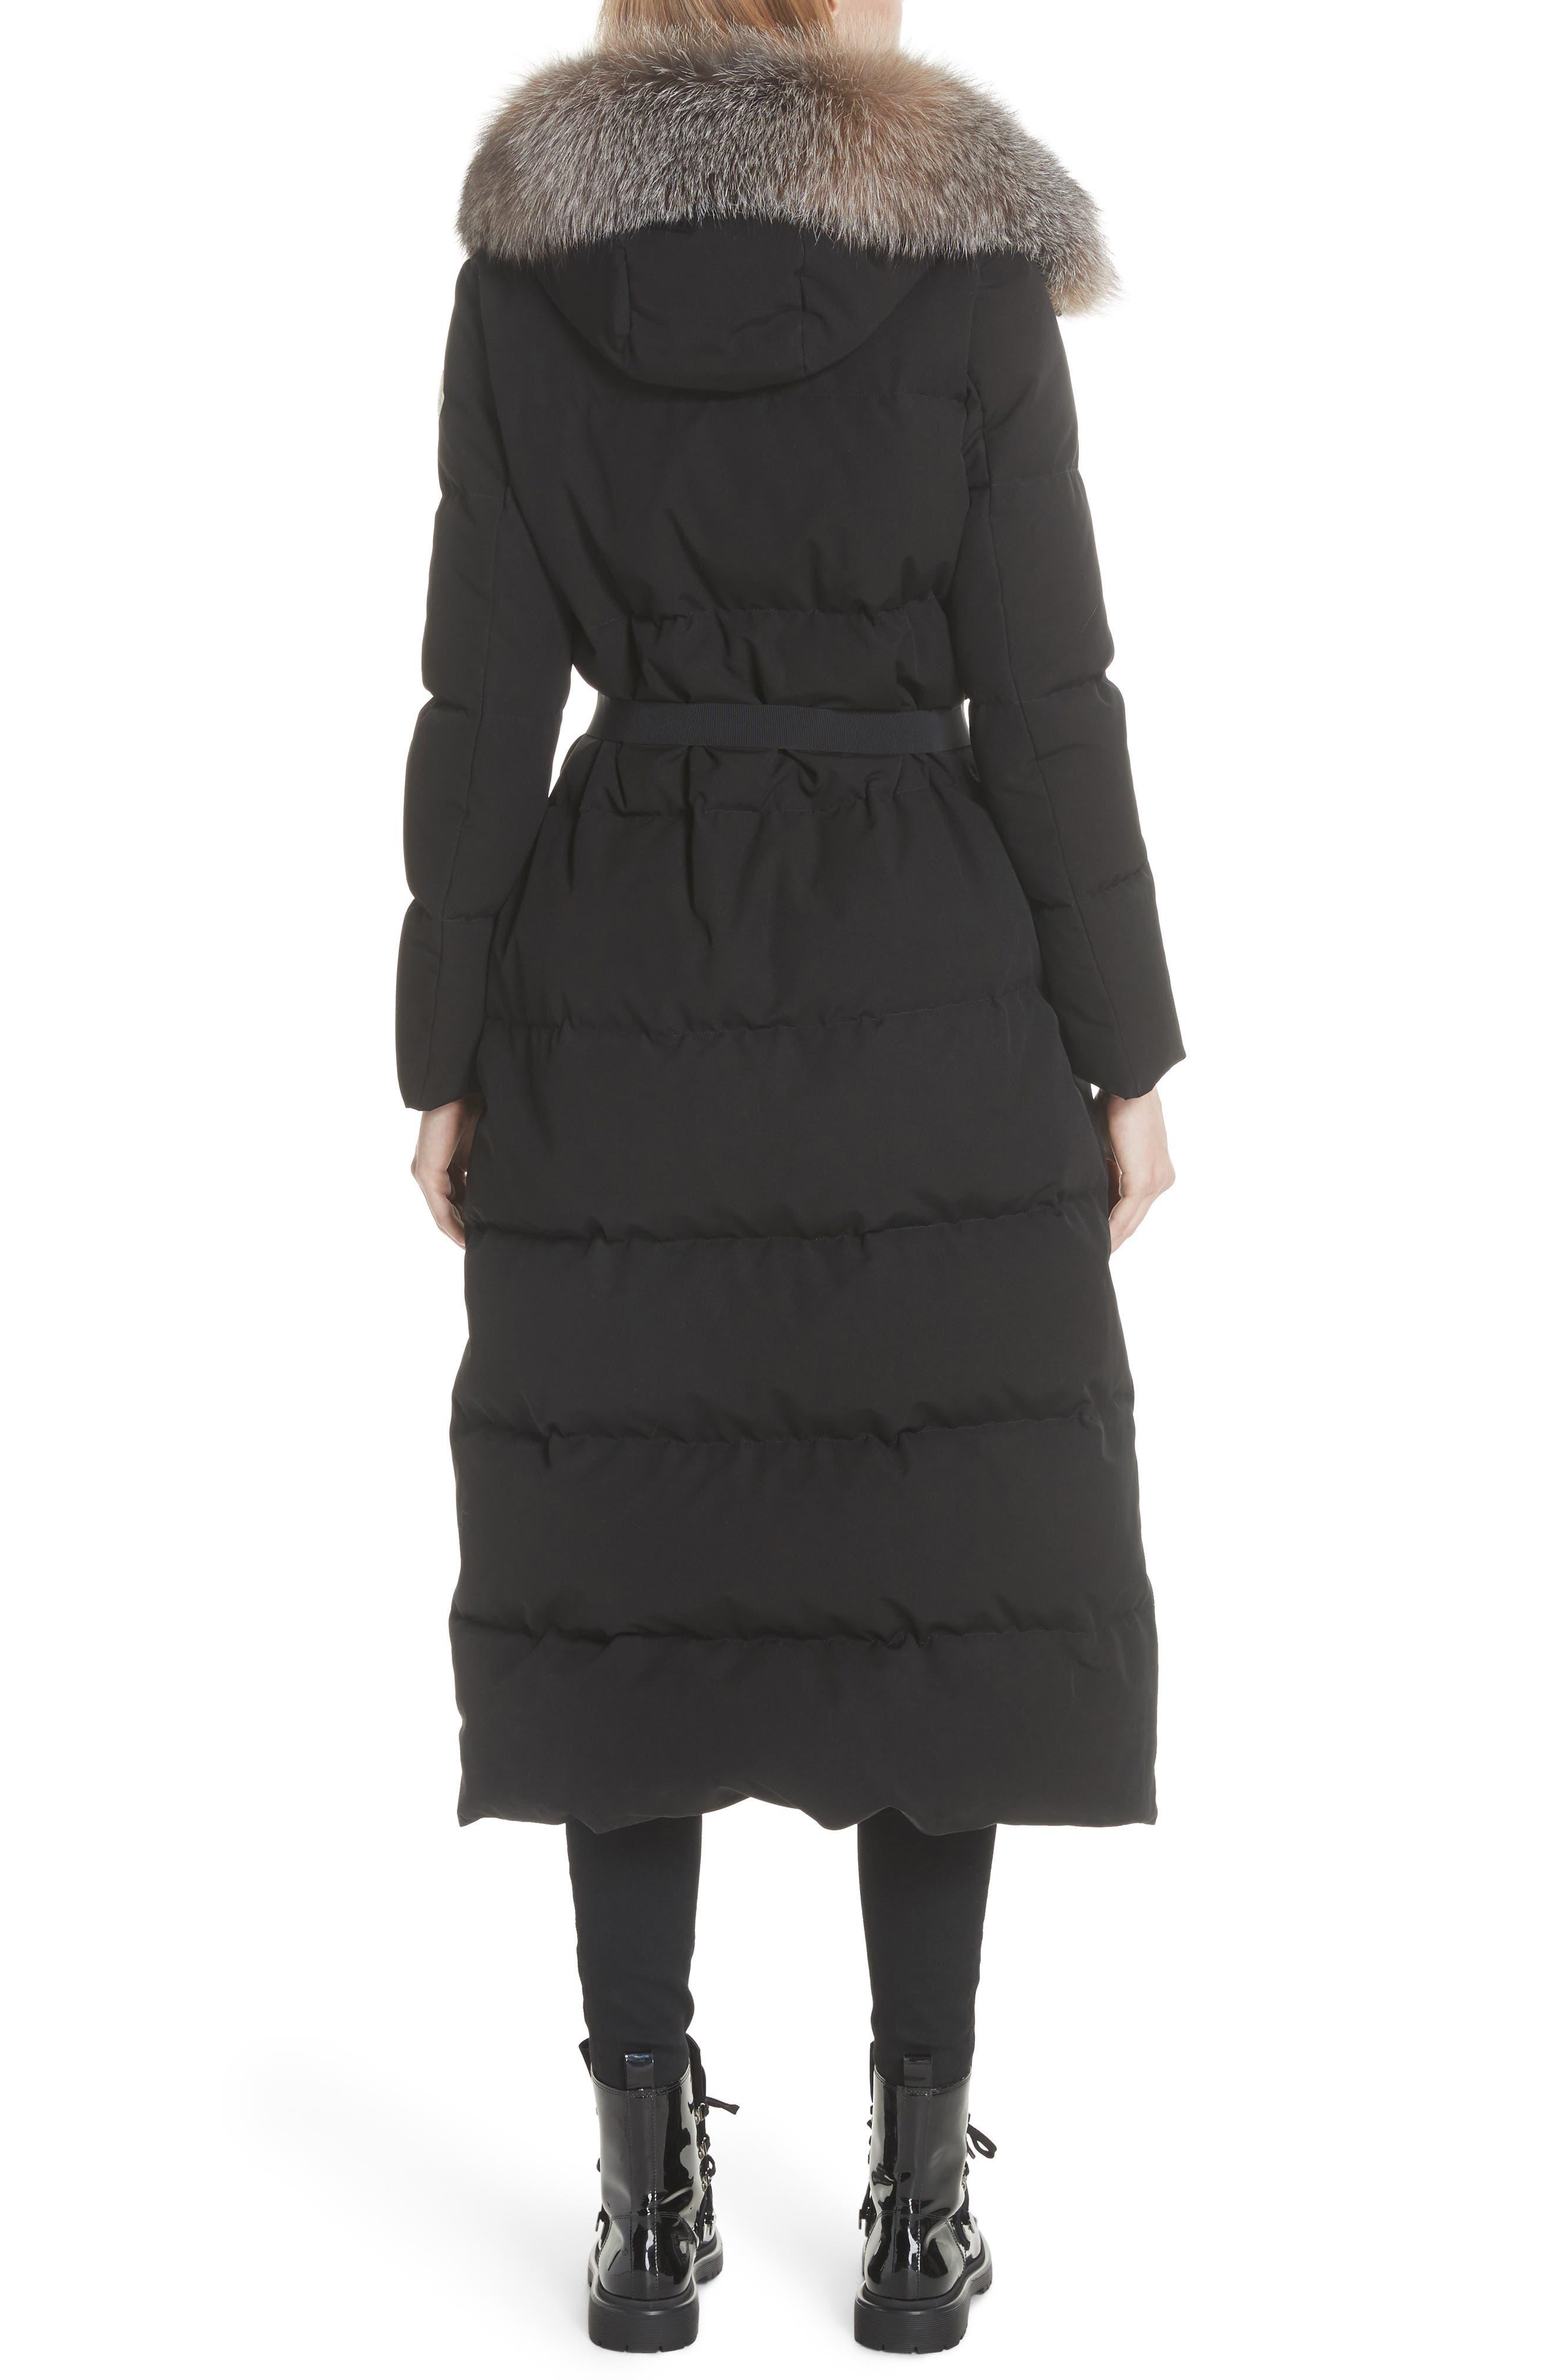 Bernache Hooded Down Coat with Removable Genuine Fox Fur Trim,                             Alternate thumbnail 2, color,                             BLACK